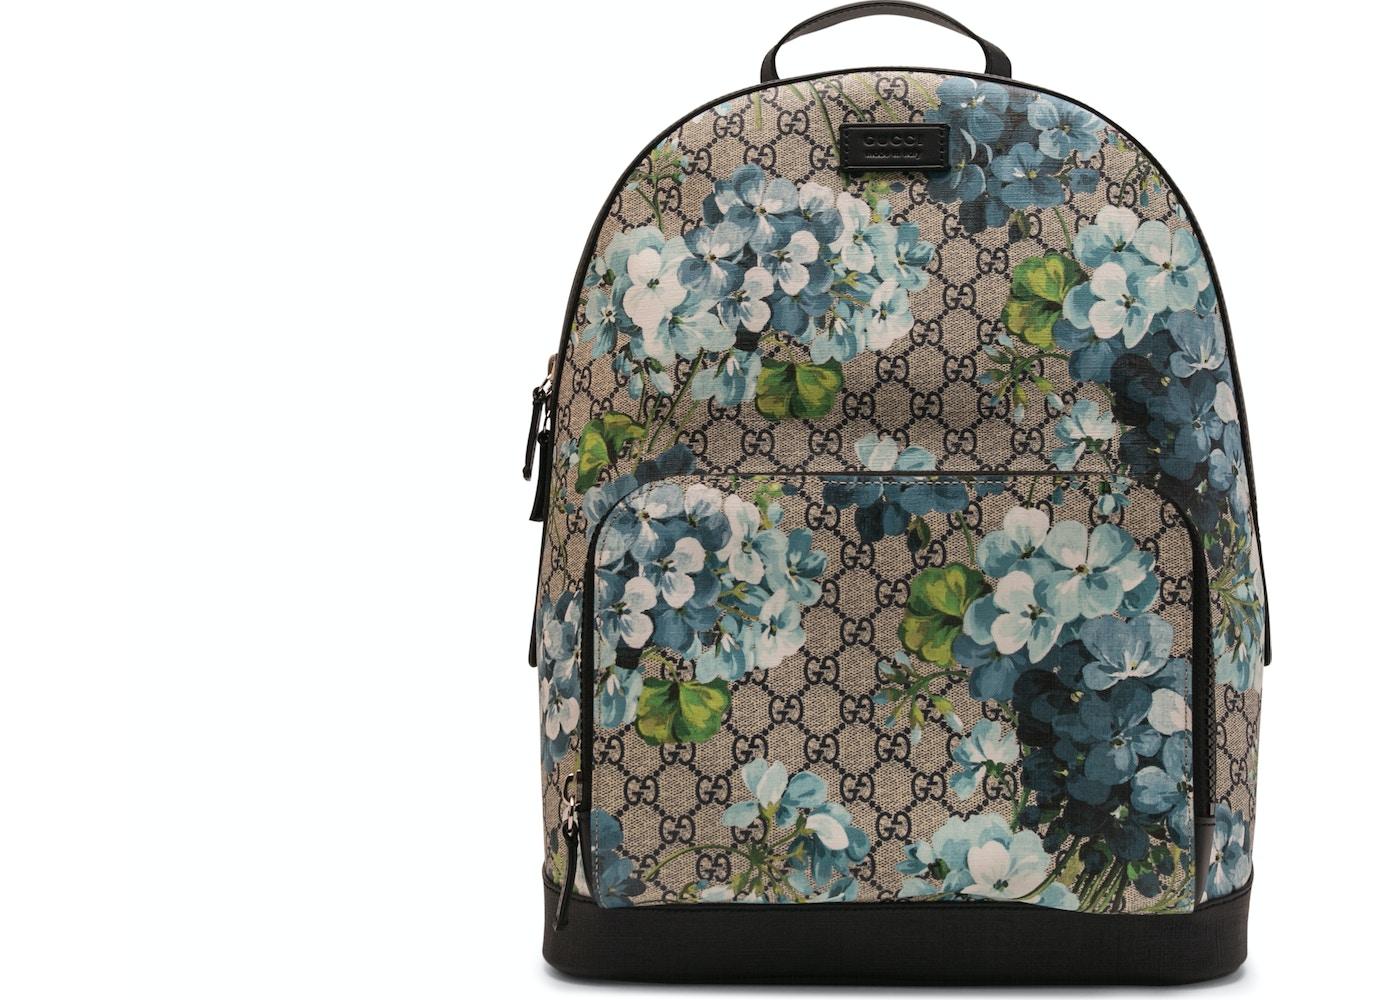 5c369eee2f8c Gucci Blooms Backpack GG Supreme Blue. GG Supreme Blue